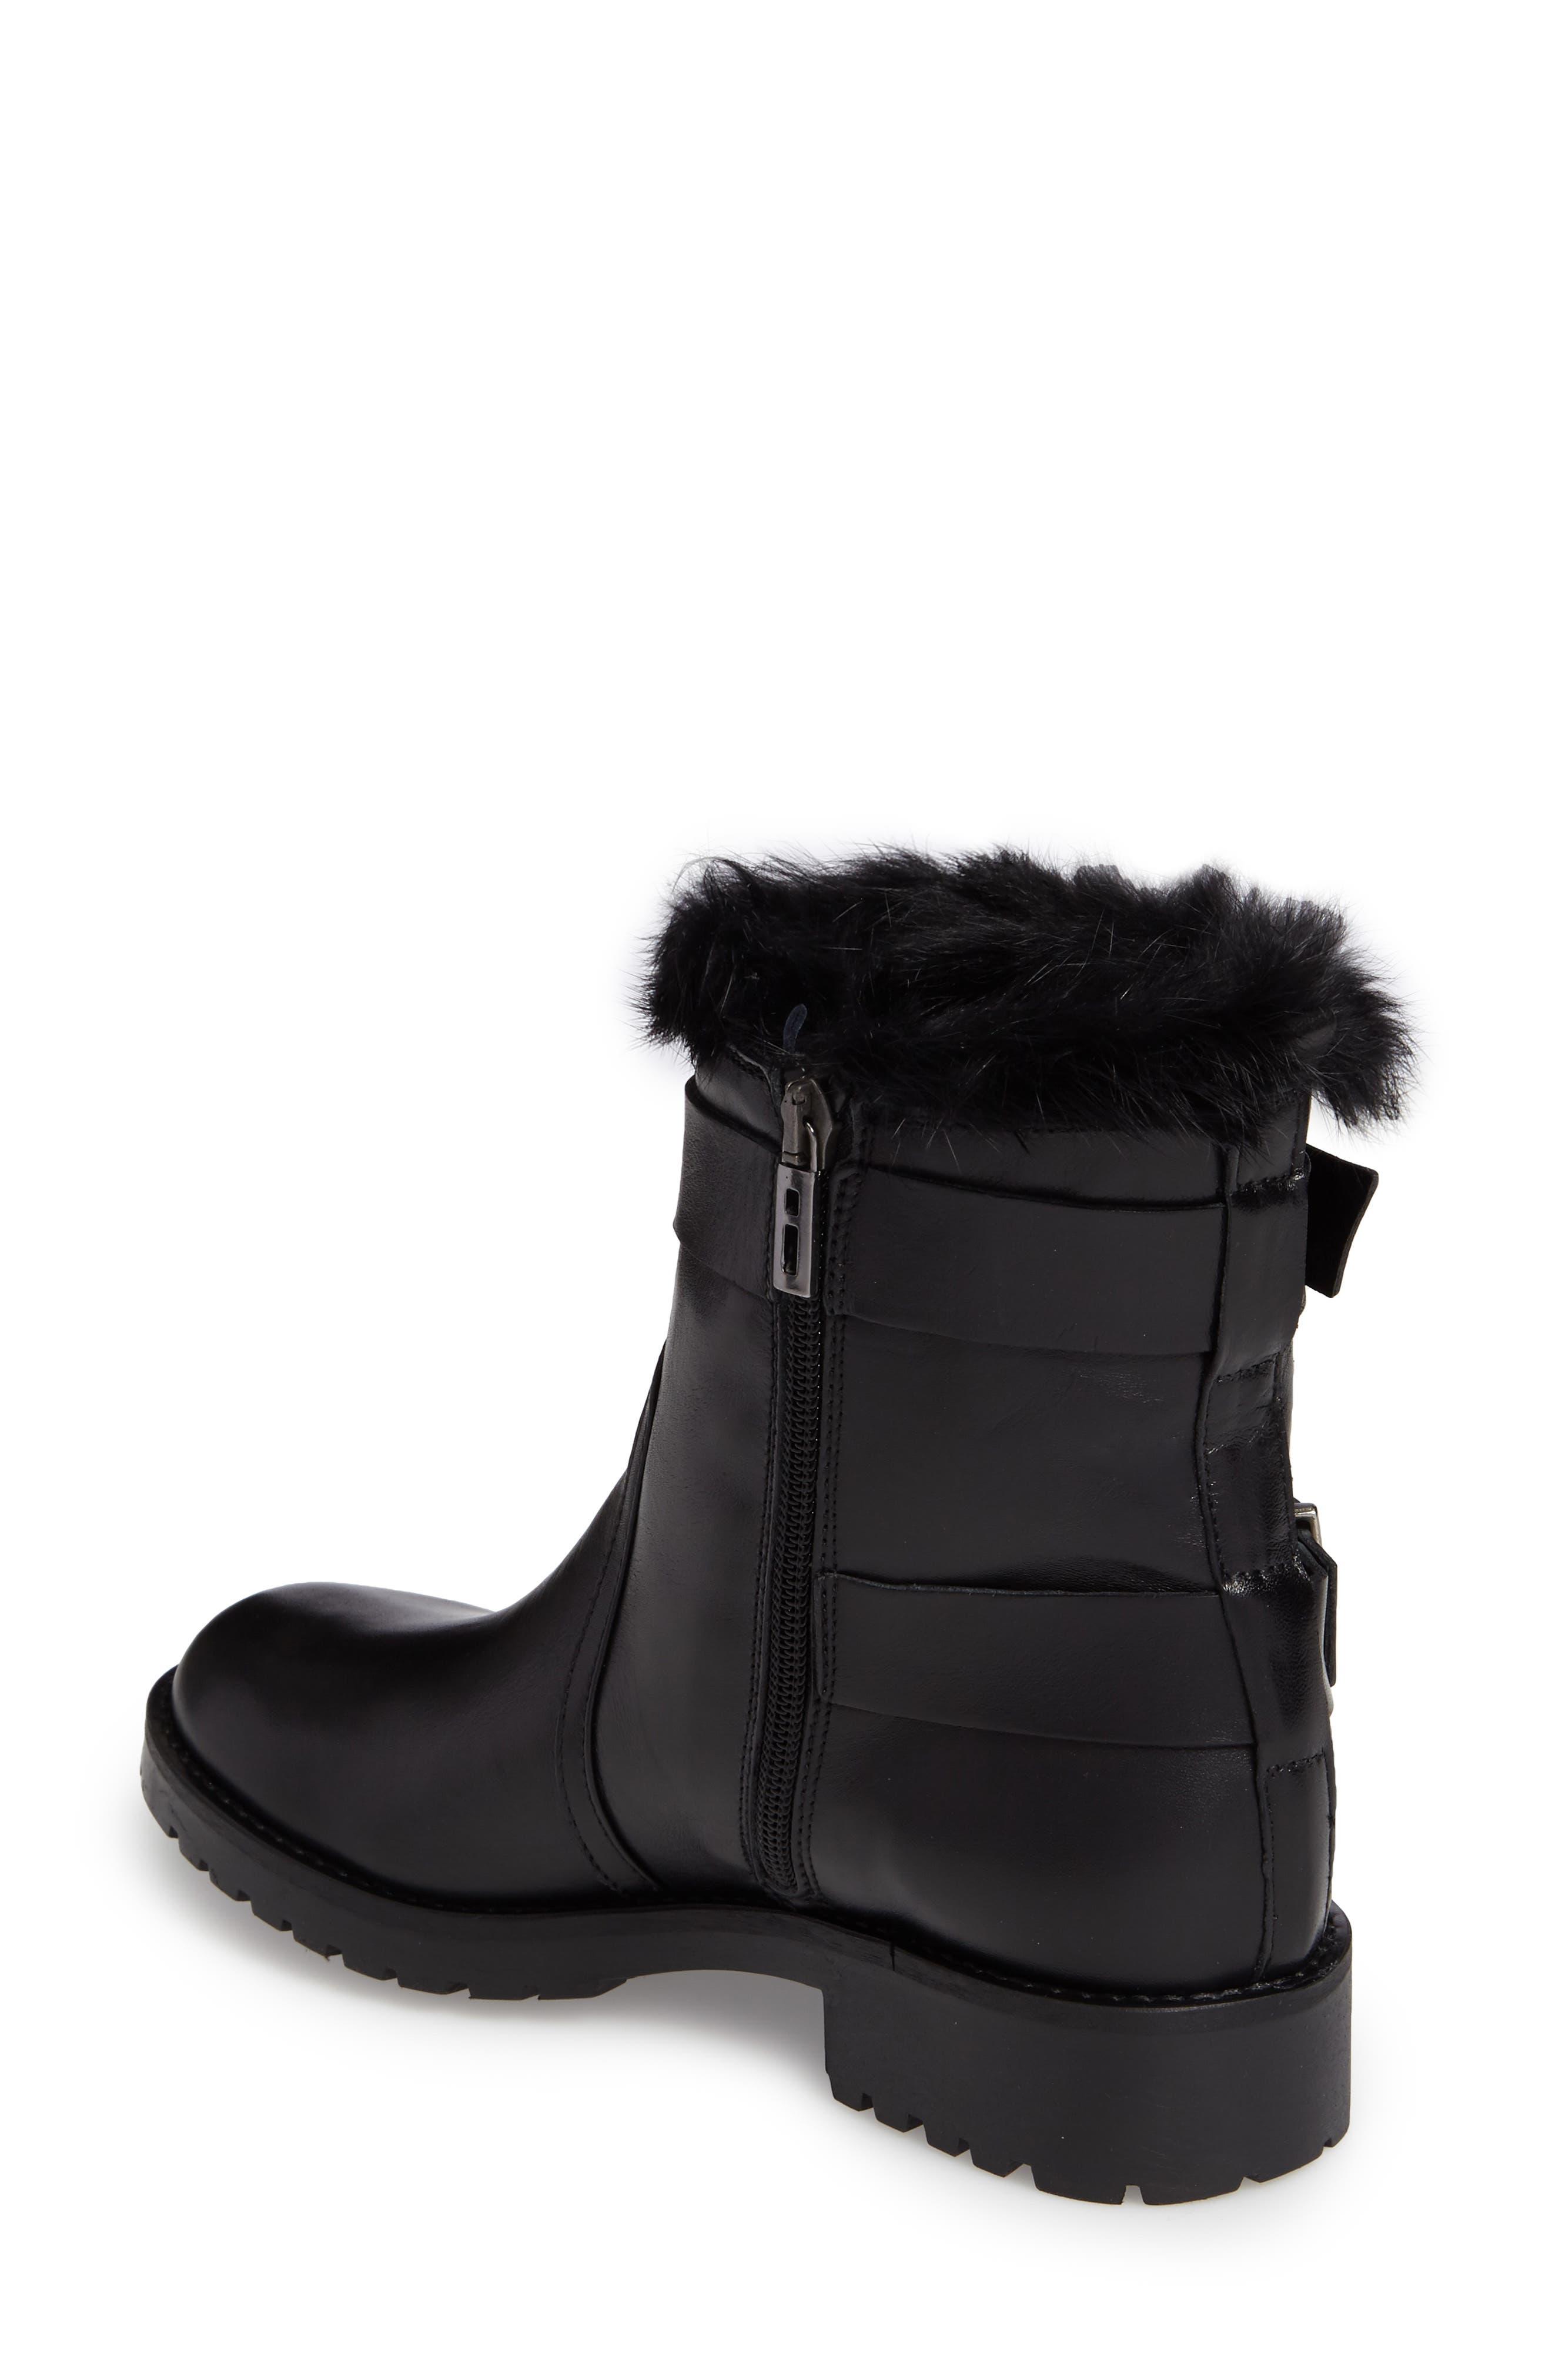 Rustic Genuine Rabbit Fur Cuff Boot,                             Alternate thumbnail 2, color,                             001